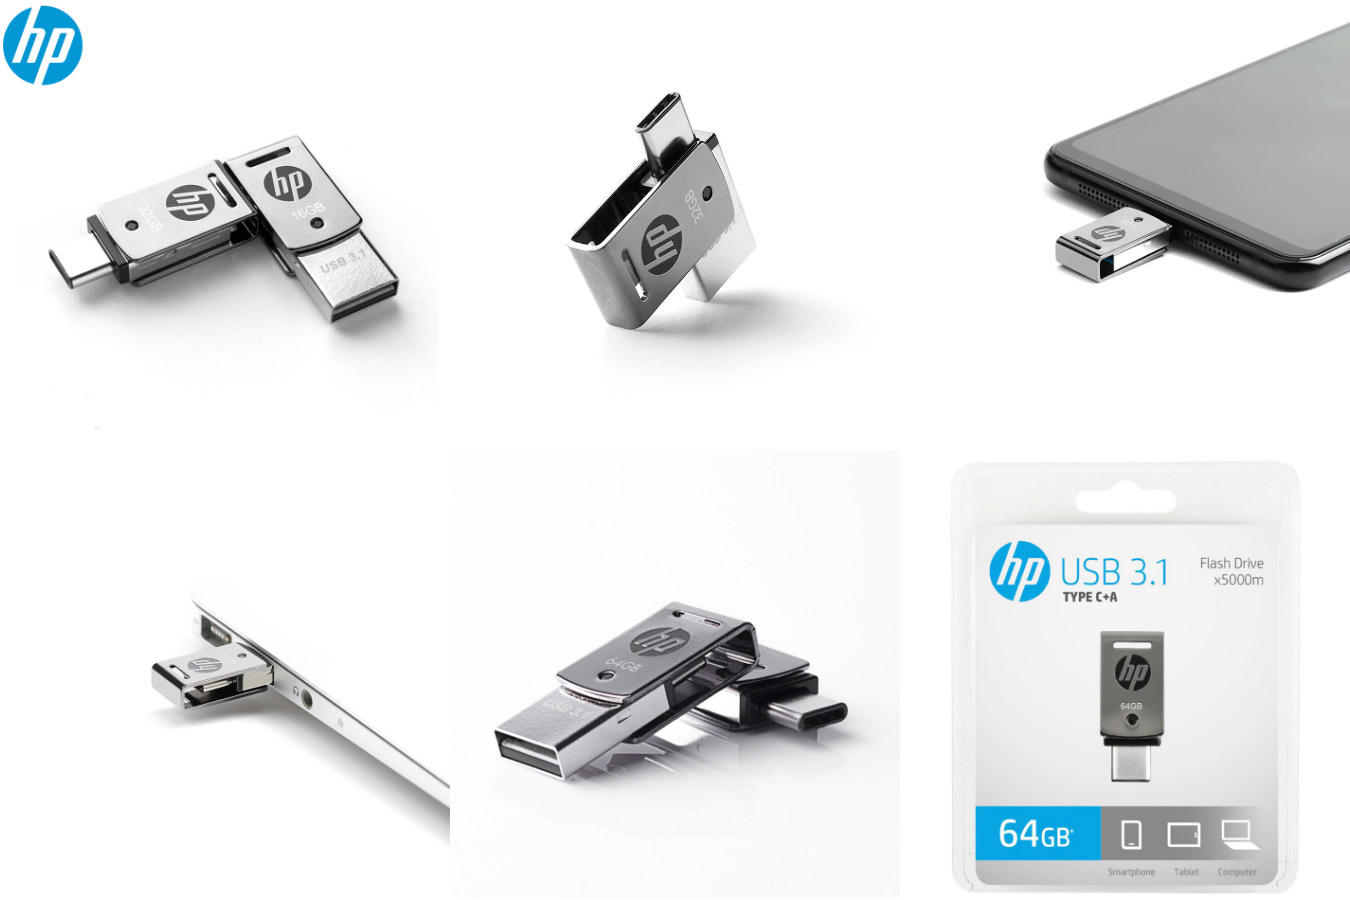 Оригинальная двойная флешка USB Flash drive HP X5000M OTG type-C USB 3.1